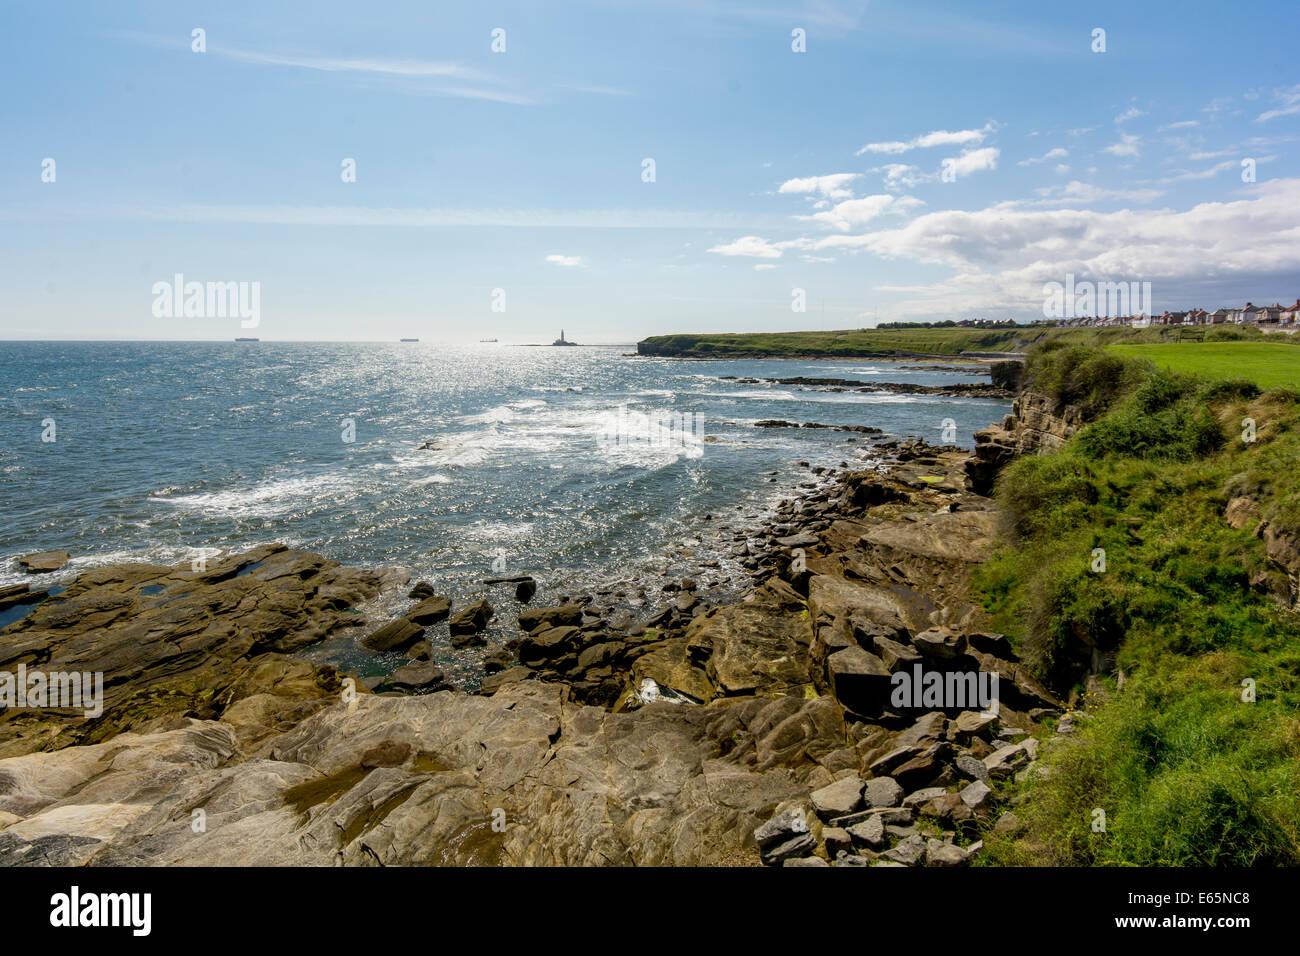 Northeast coast - Stock Image